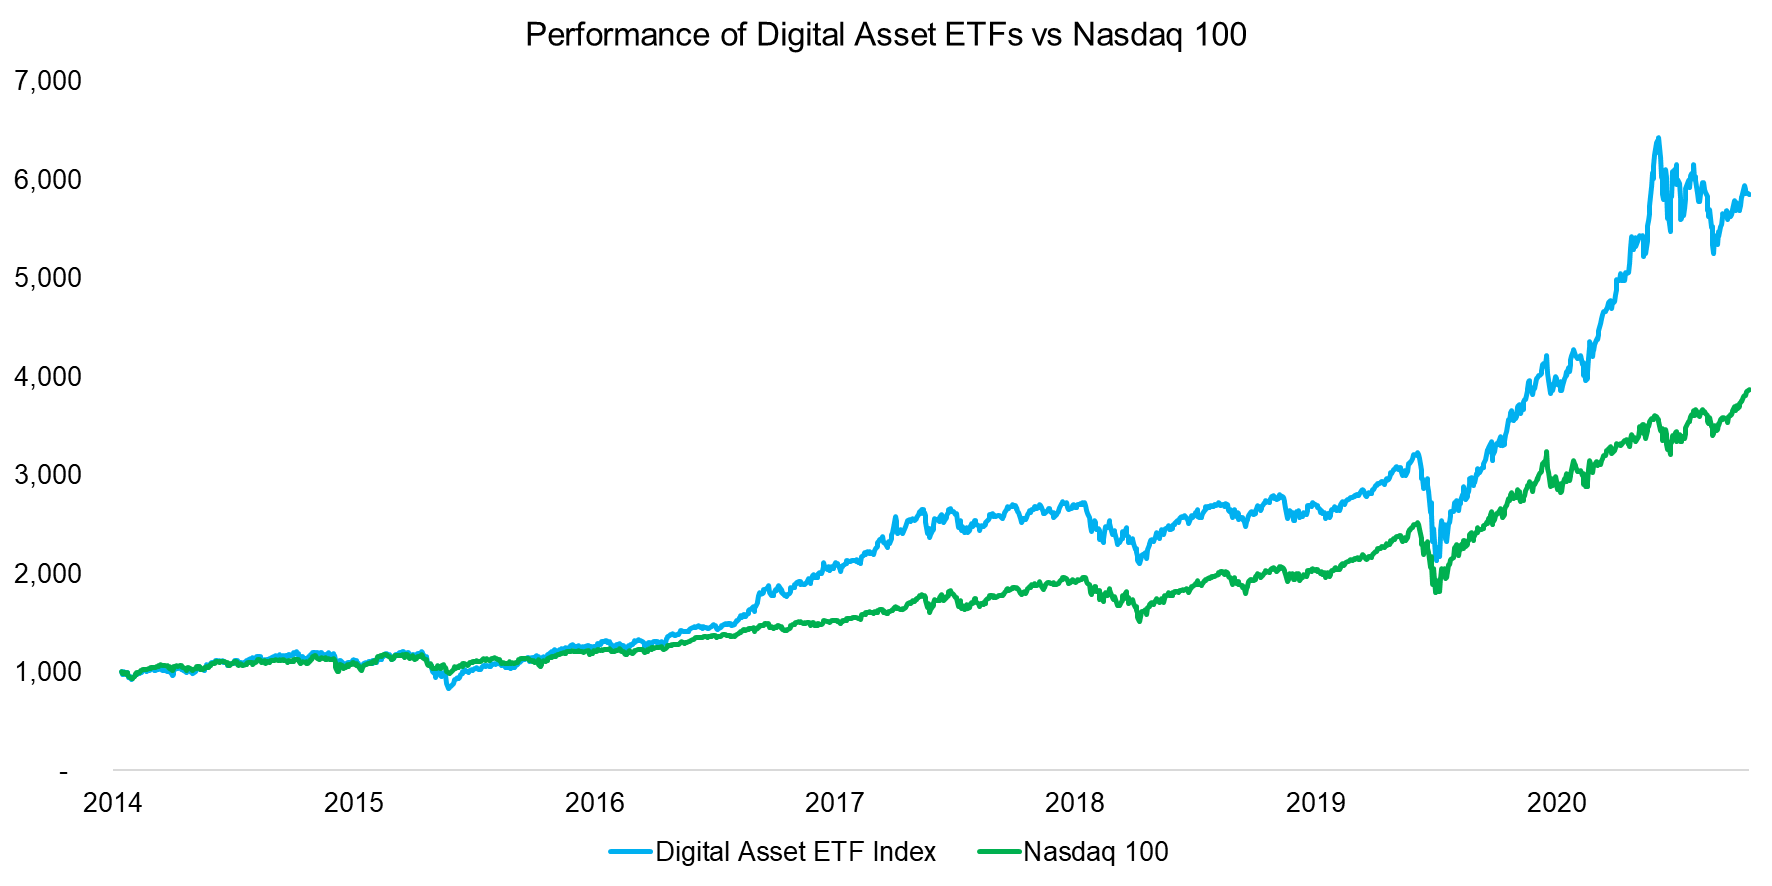 Performance of Digital Asset ETFs vs Nasdaq 100